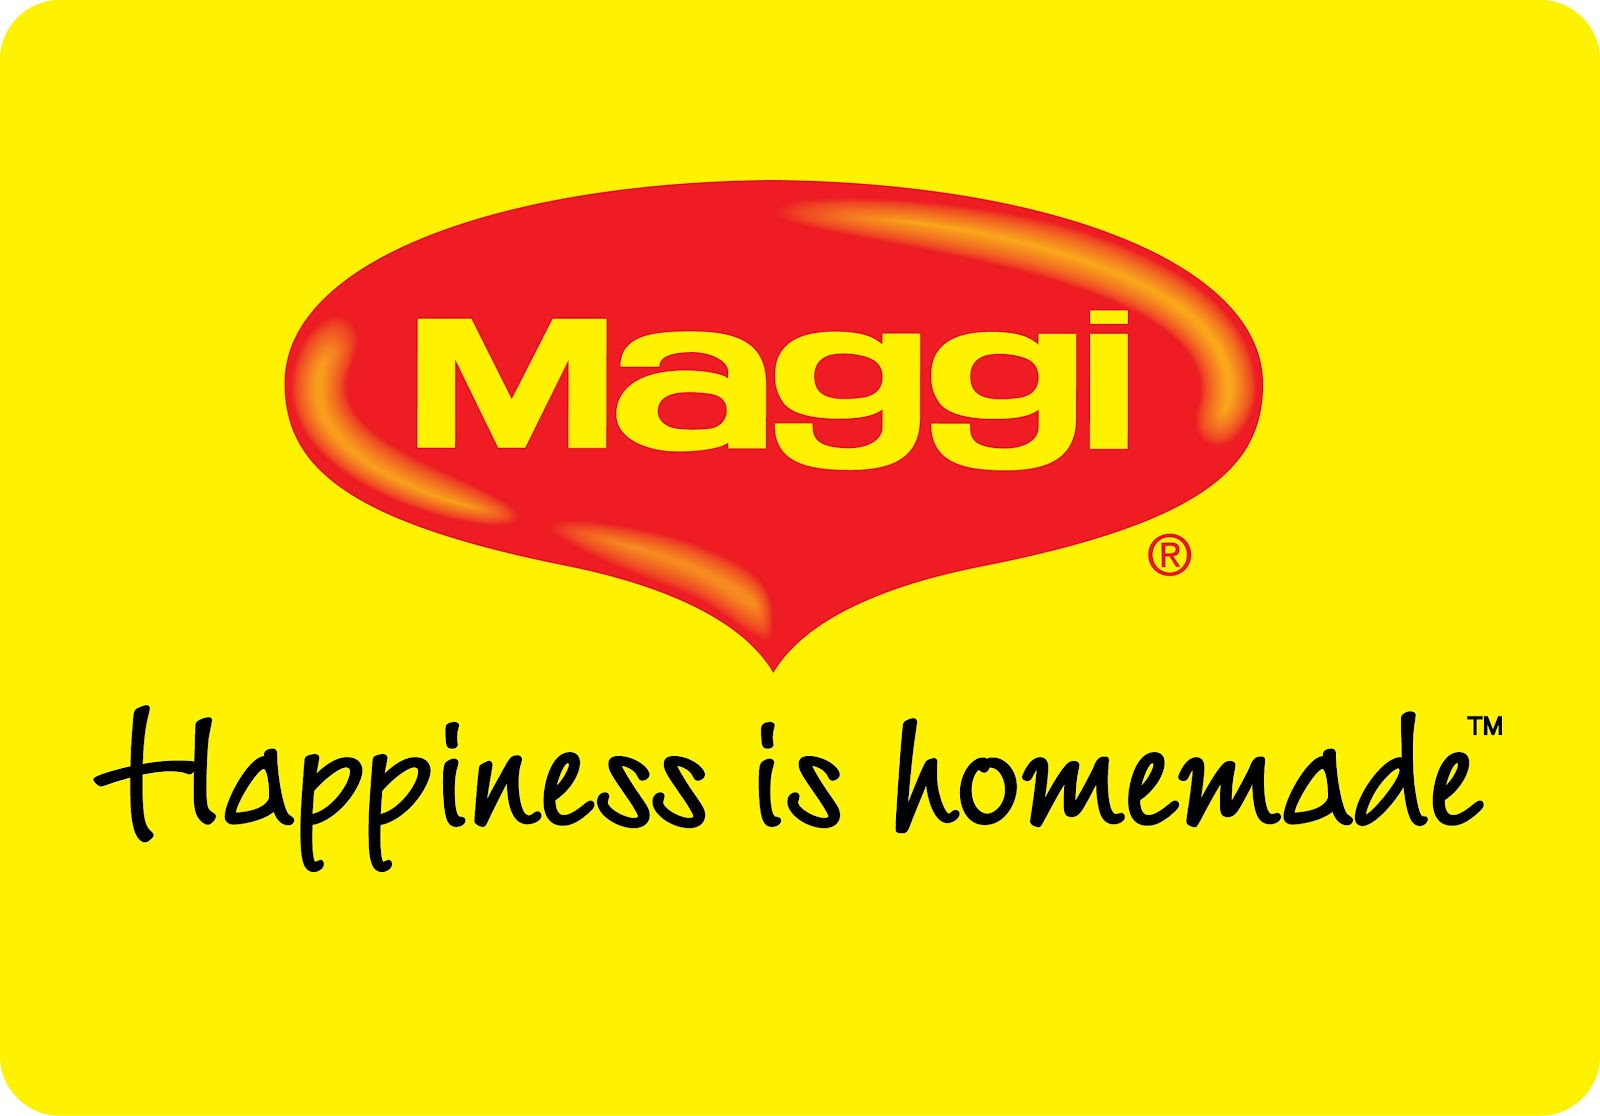 voice within me introducing new maggi mi goreng kari ori